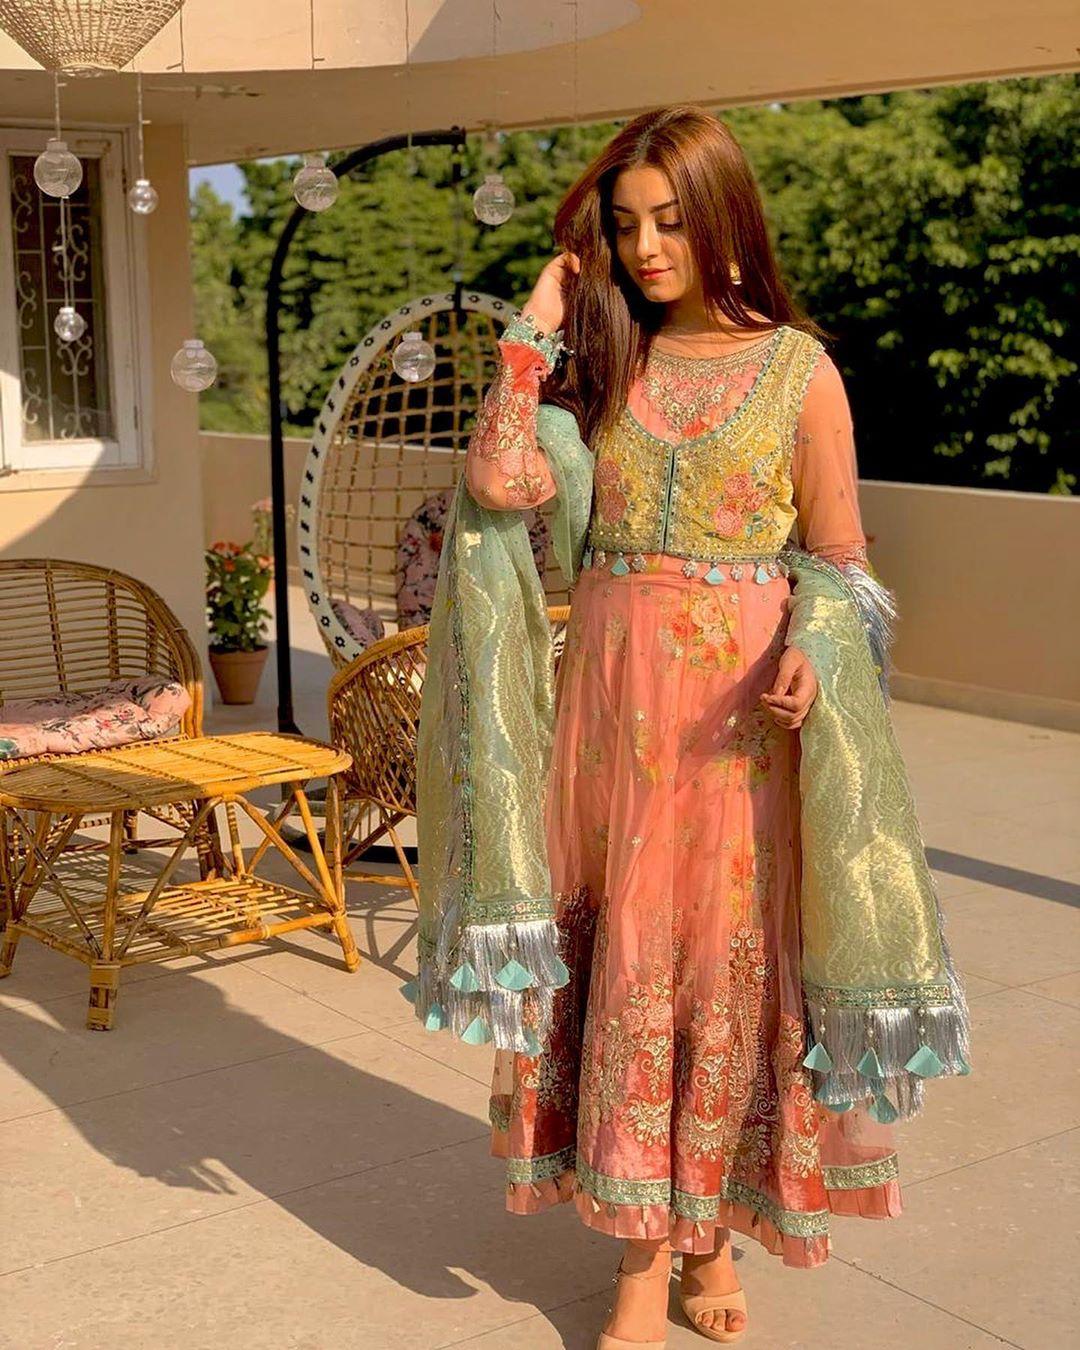 Drama Ehd-e-Wafa Girl Alizeh Shah Latest Beautiful Clicks